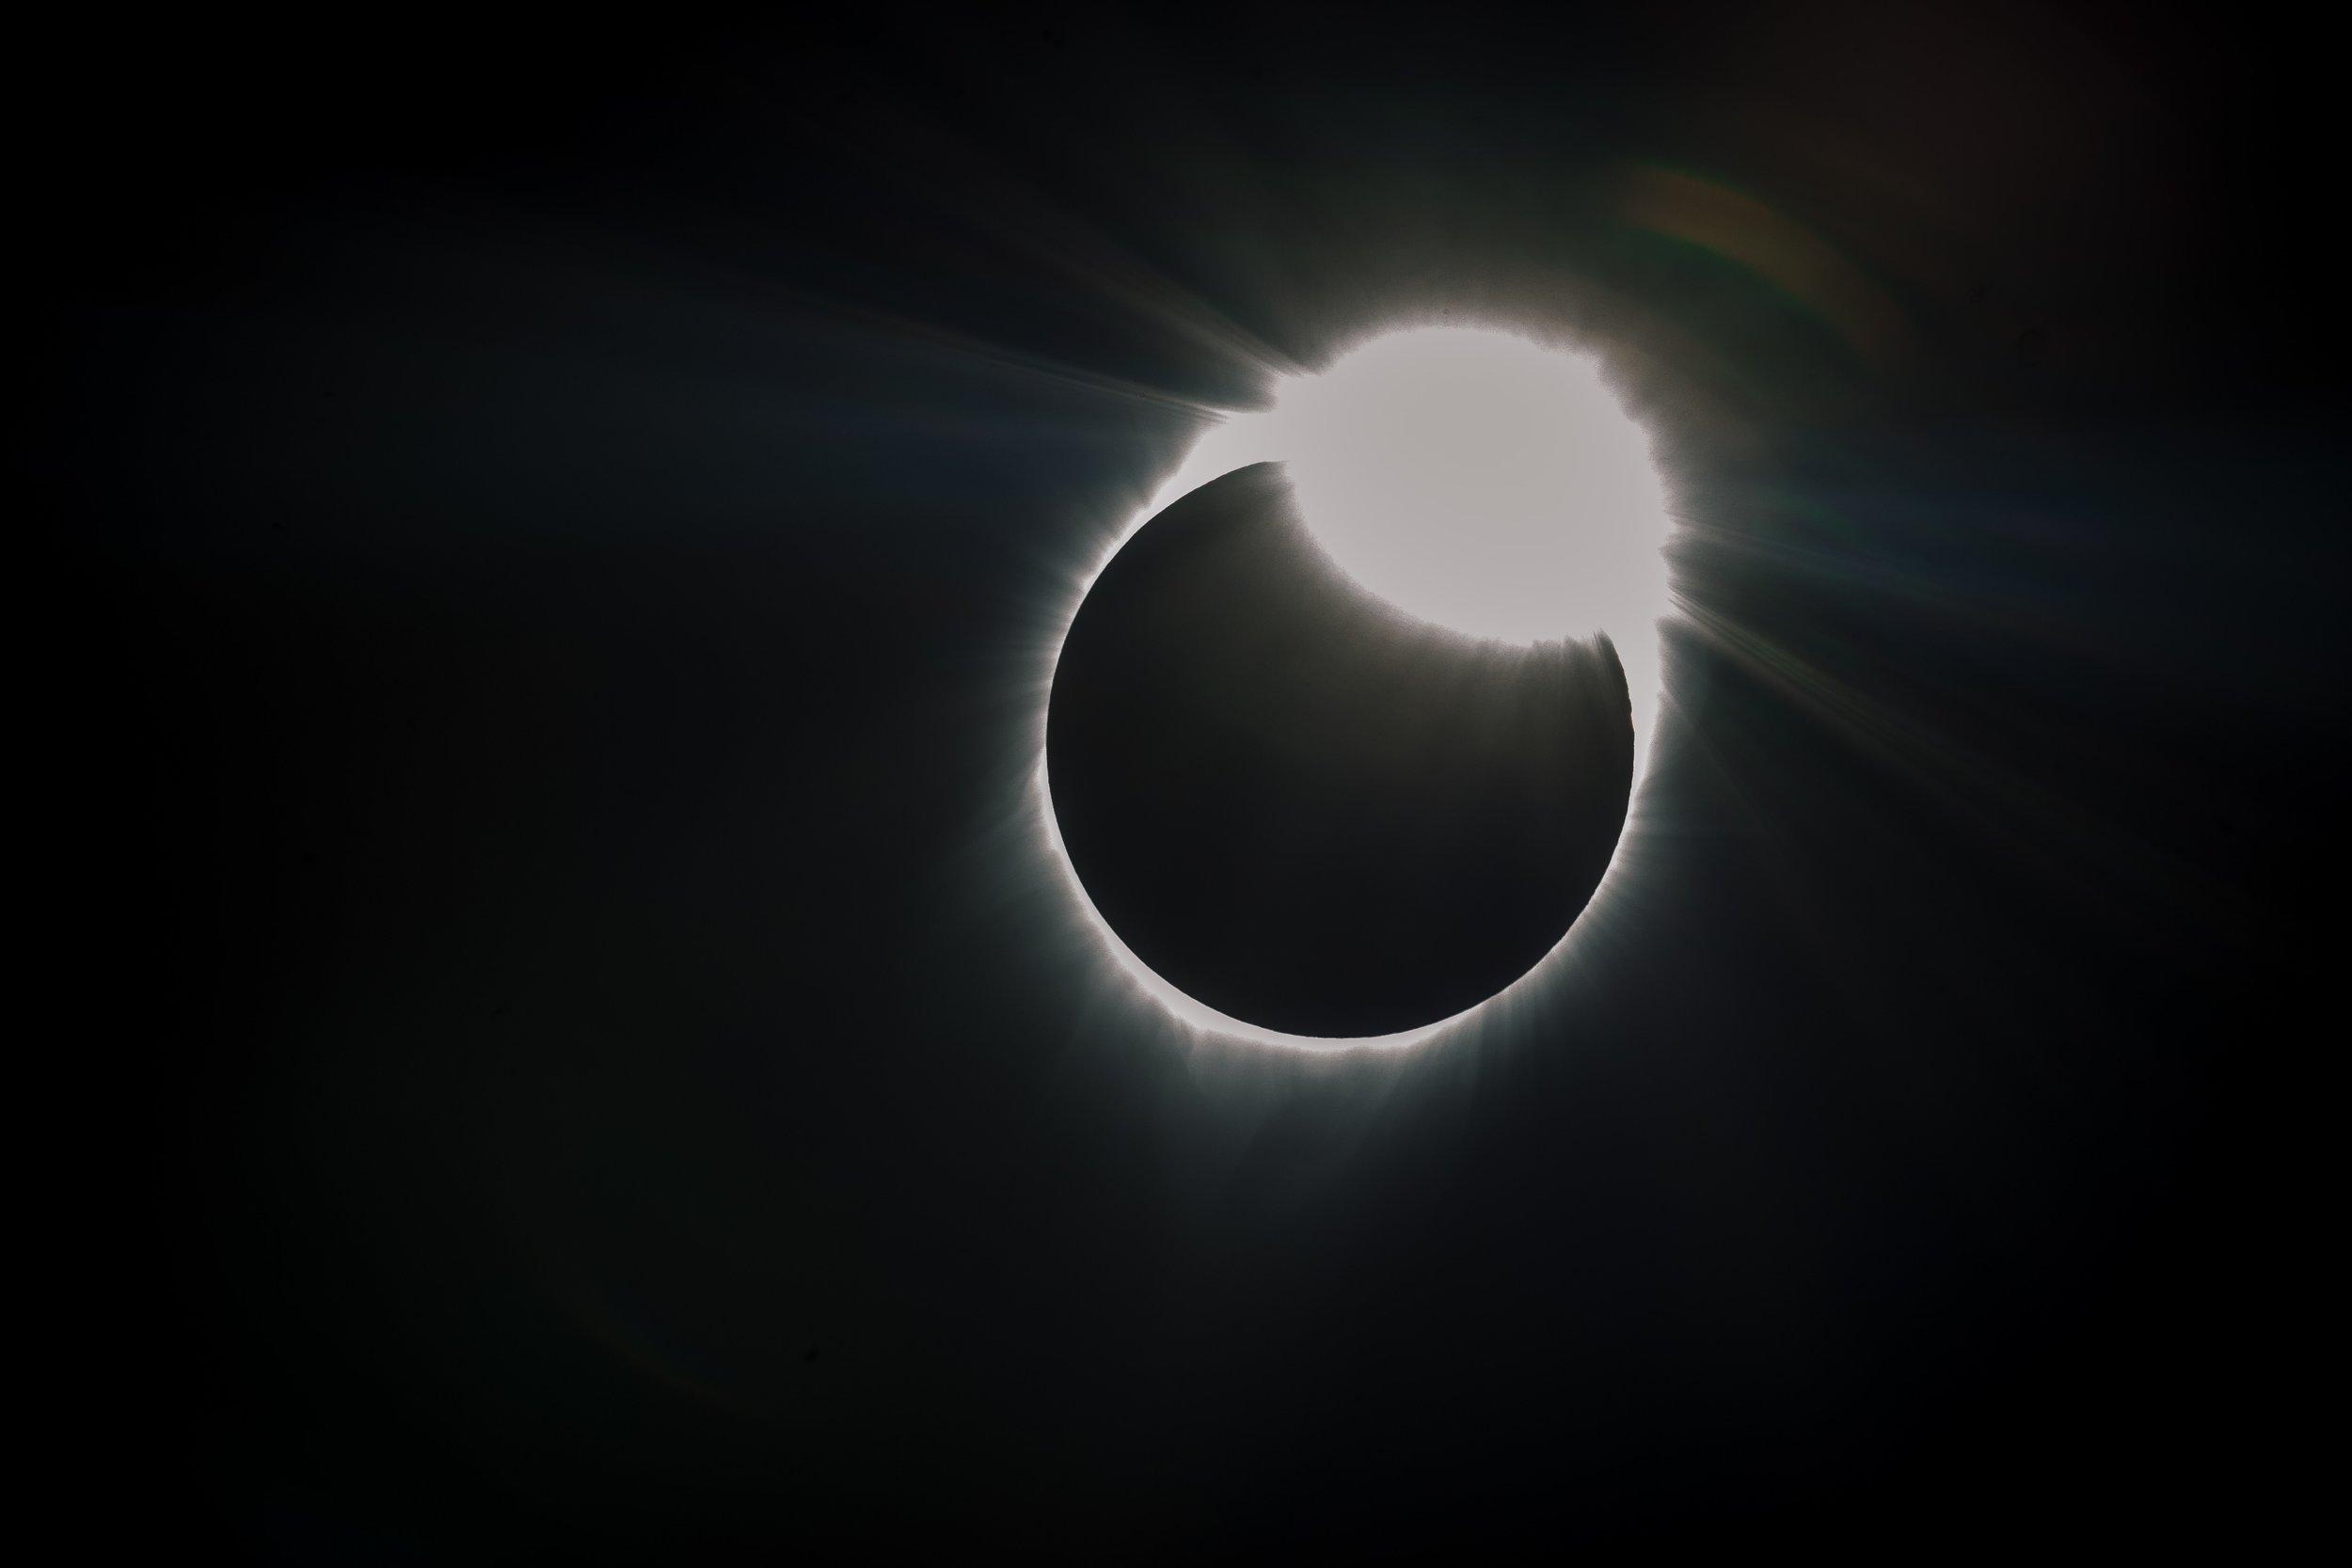 KimCarroll.com- Eclipse-4-min.jpg